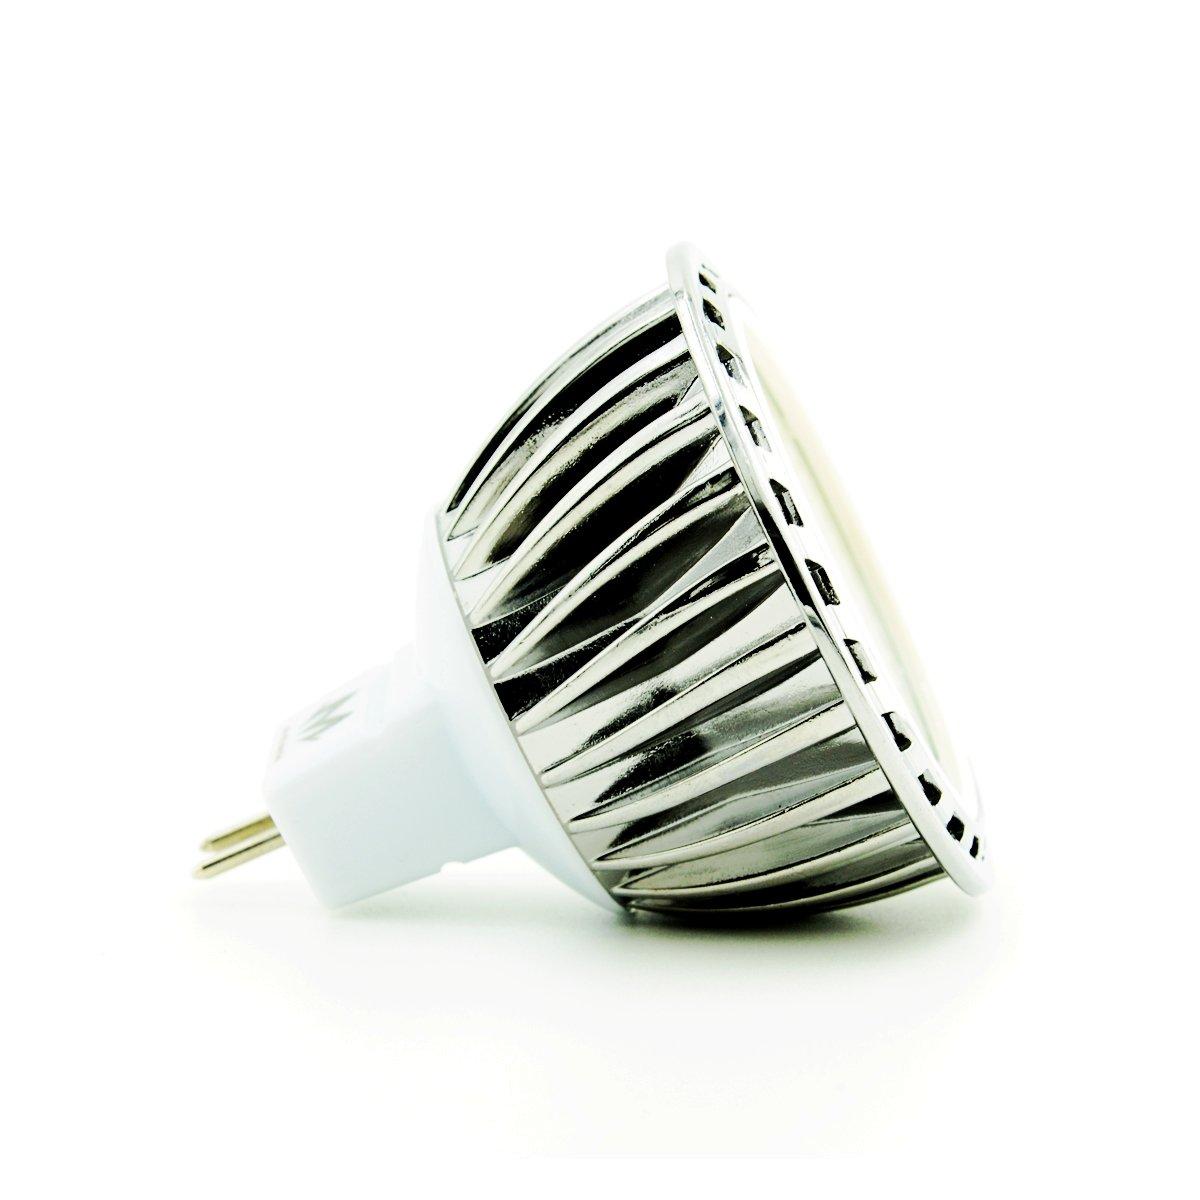 Cob Led,MR16 Spotlight,GU5.3 LED MR16 Size,350lm,12V,60/° M02013W0 6-pack,Warm White Mylite 5W MR16 LED Bulb Light,50W Halogen Lamp Replacement